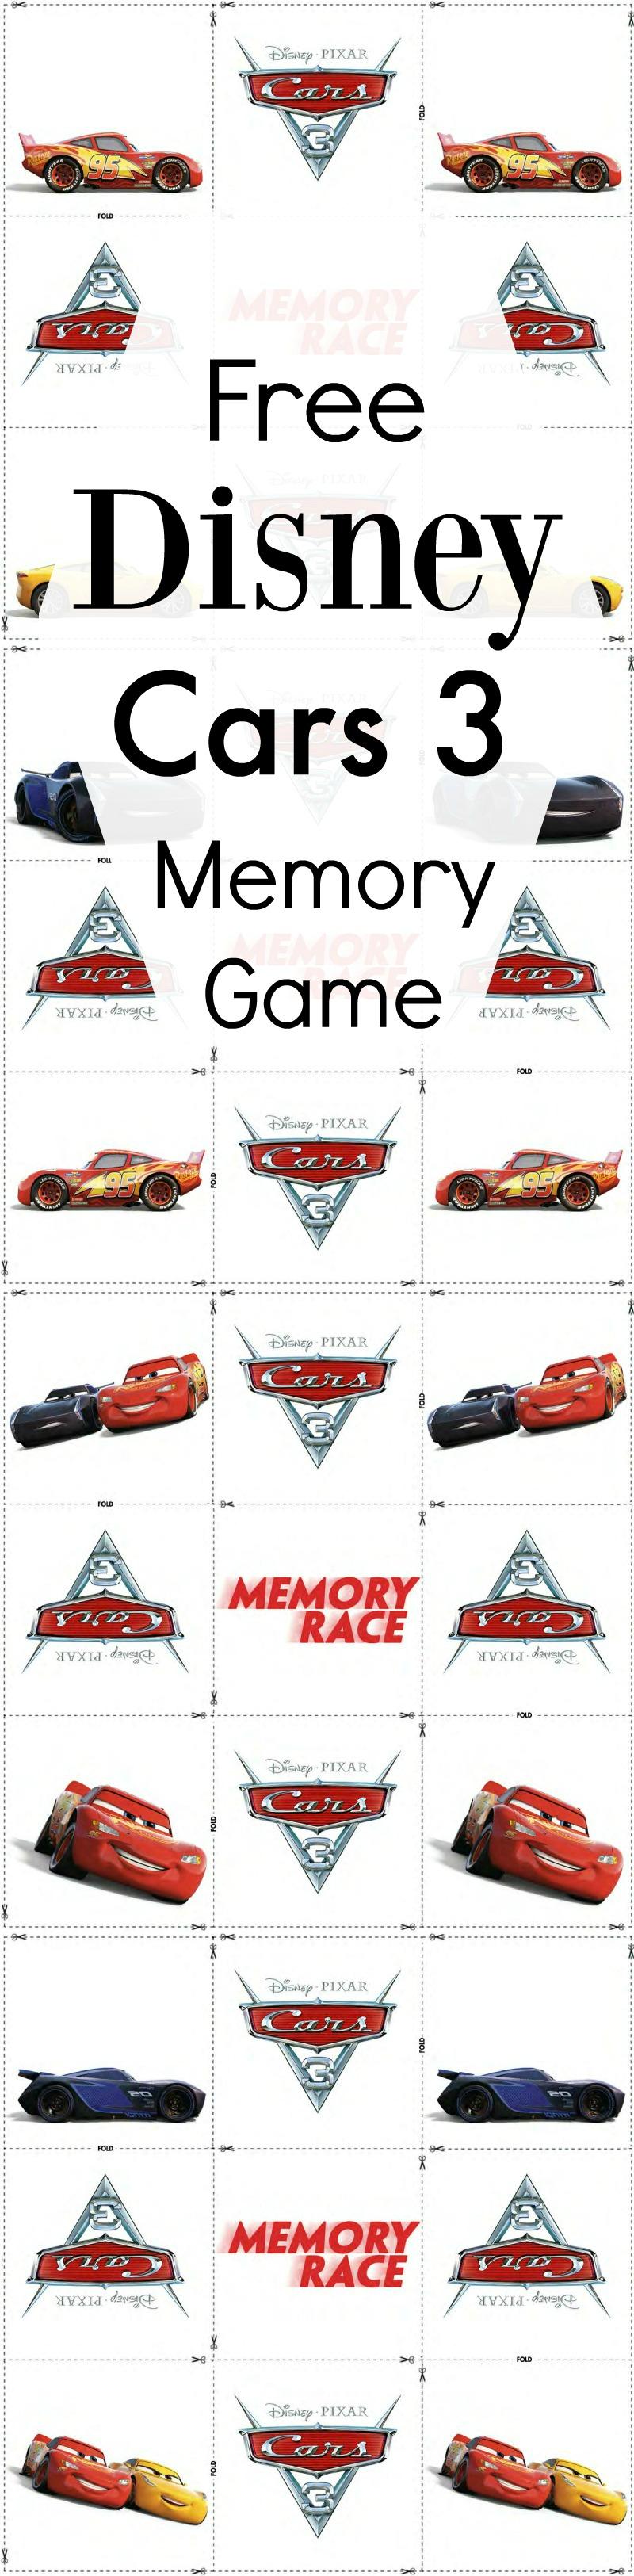 Free Disney Cars 3 Memory Match Game - Printable Memory Cards